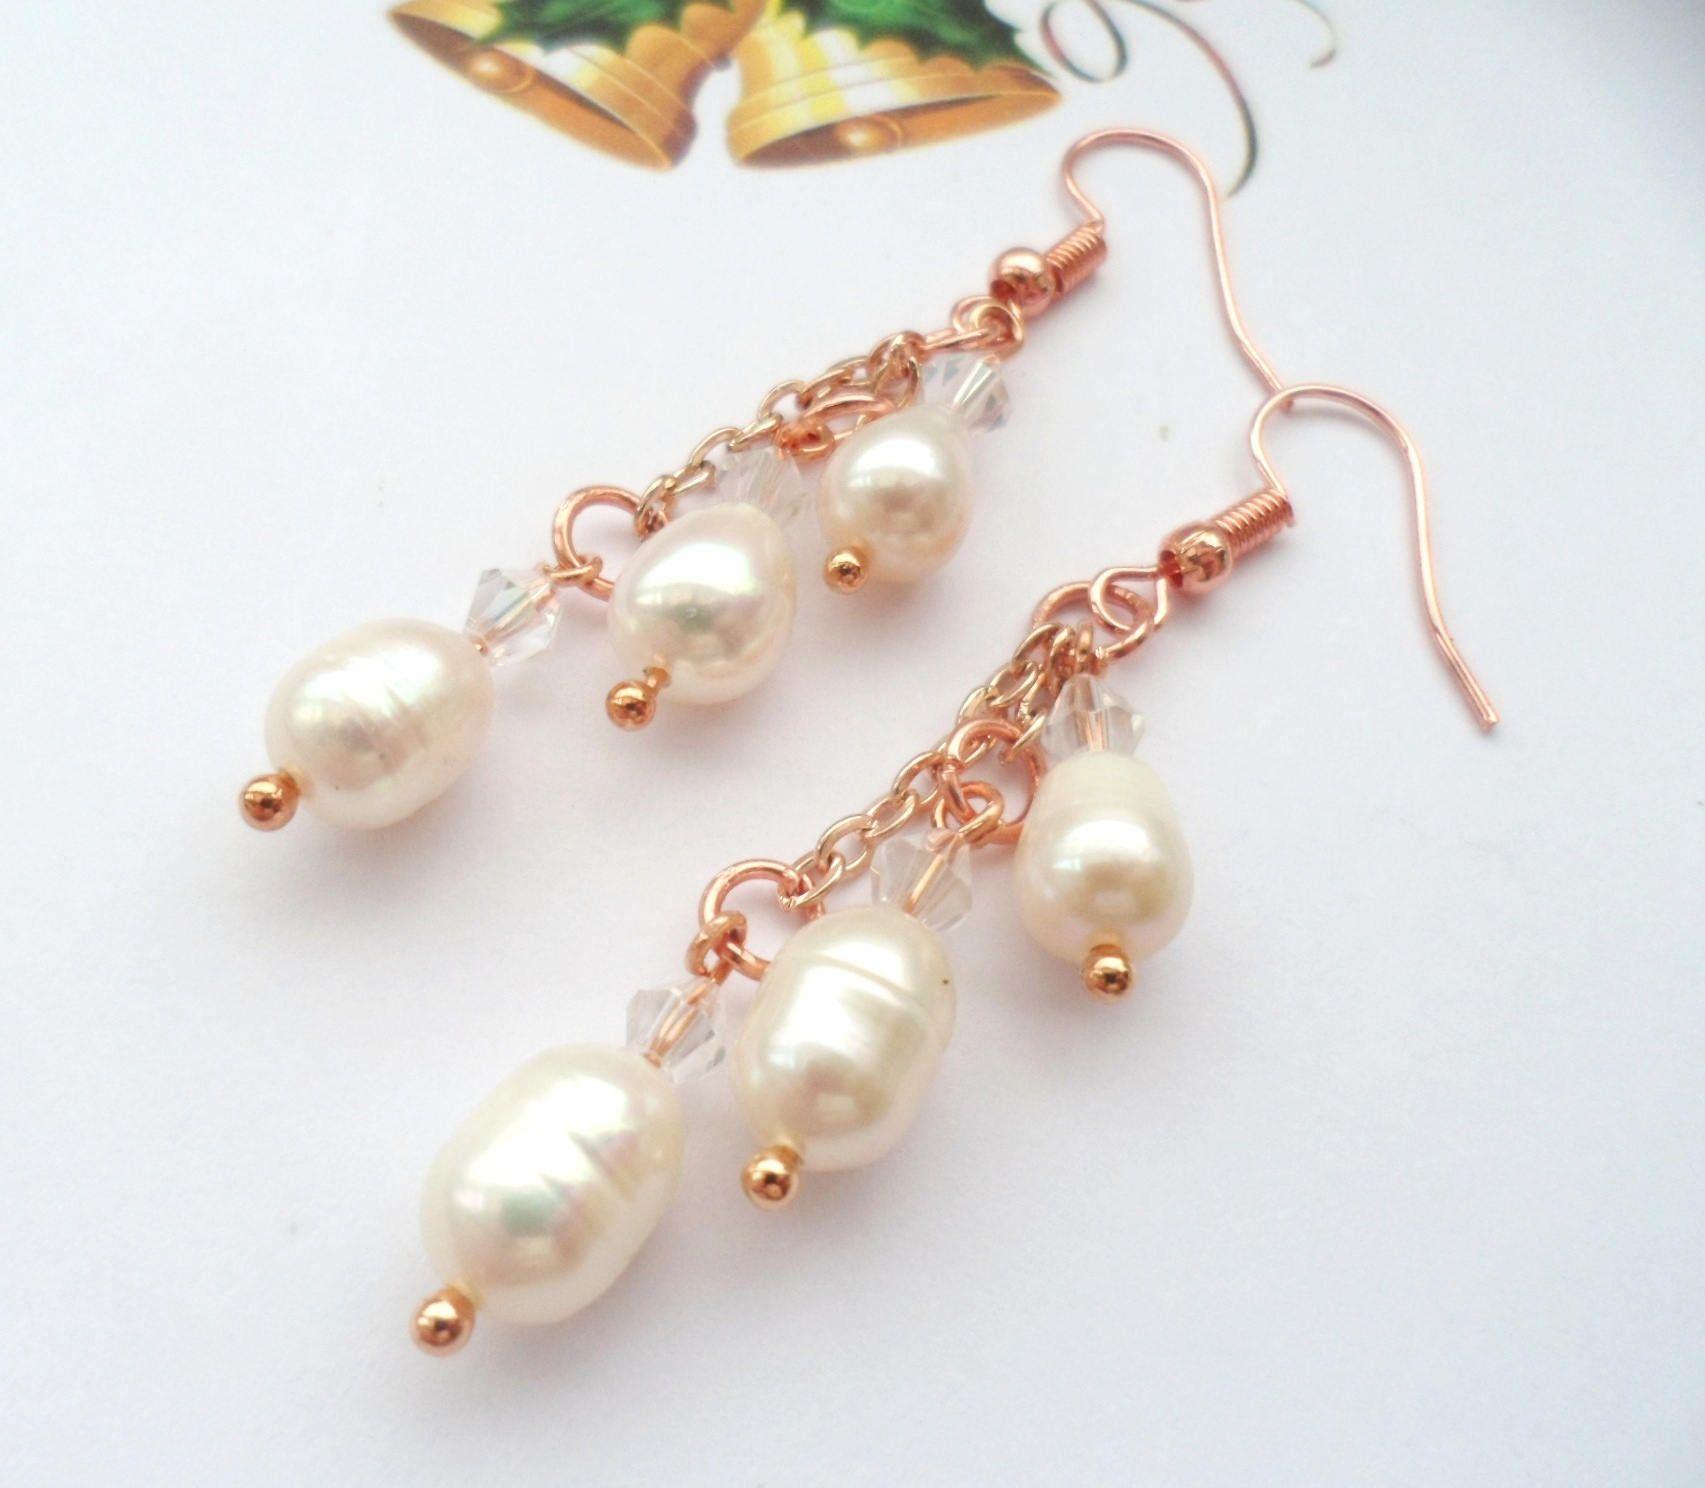 Freshwater pearl chandelier earrings pearl jewellery rose gold freshwater pearl chandelier earrings pearl jewellery rose gold jewellery gift for her aloadofball Images